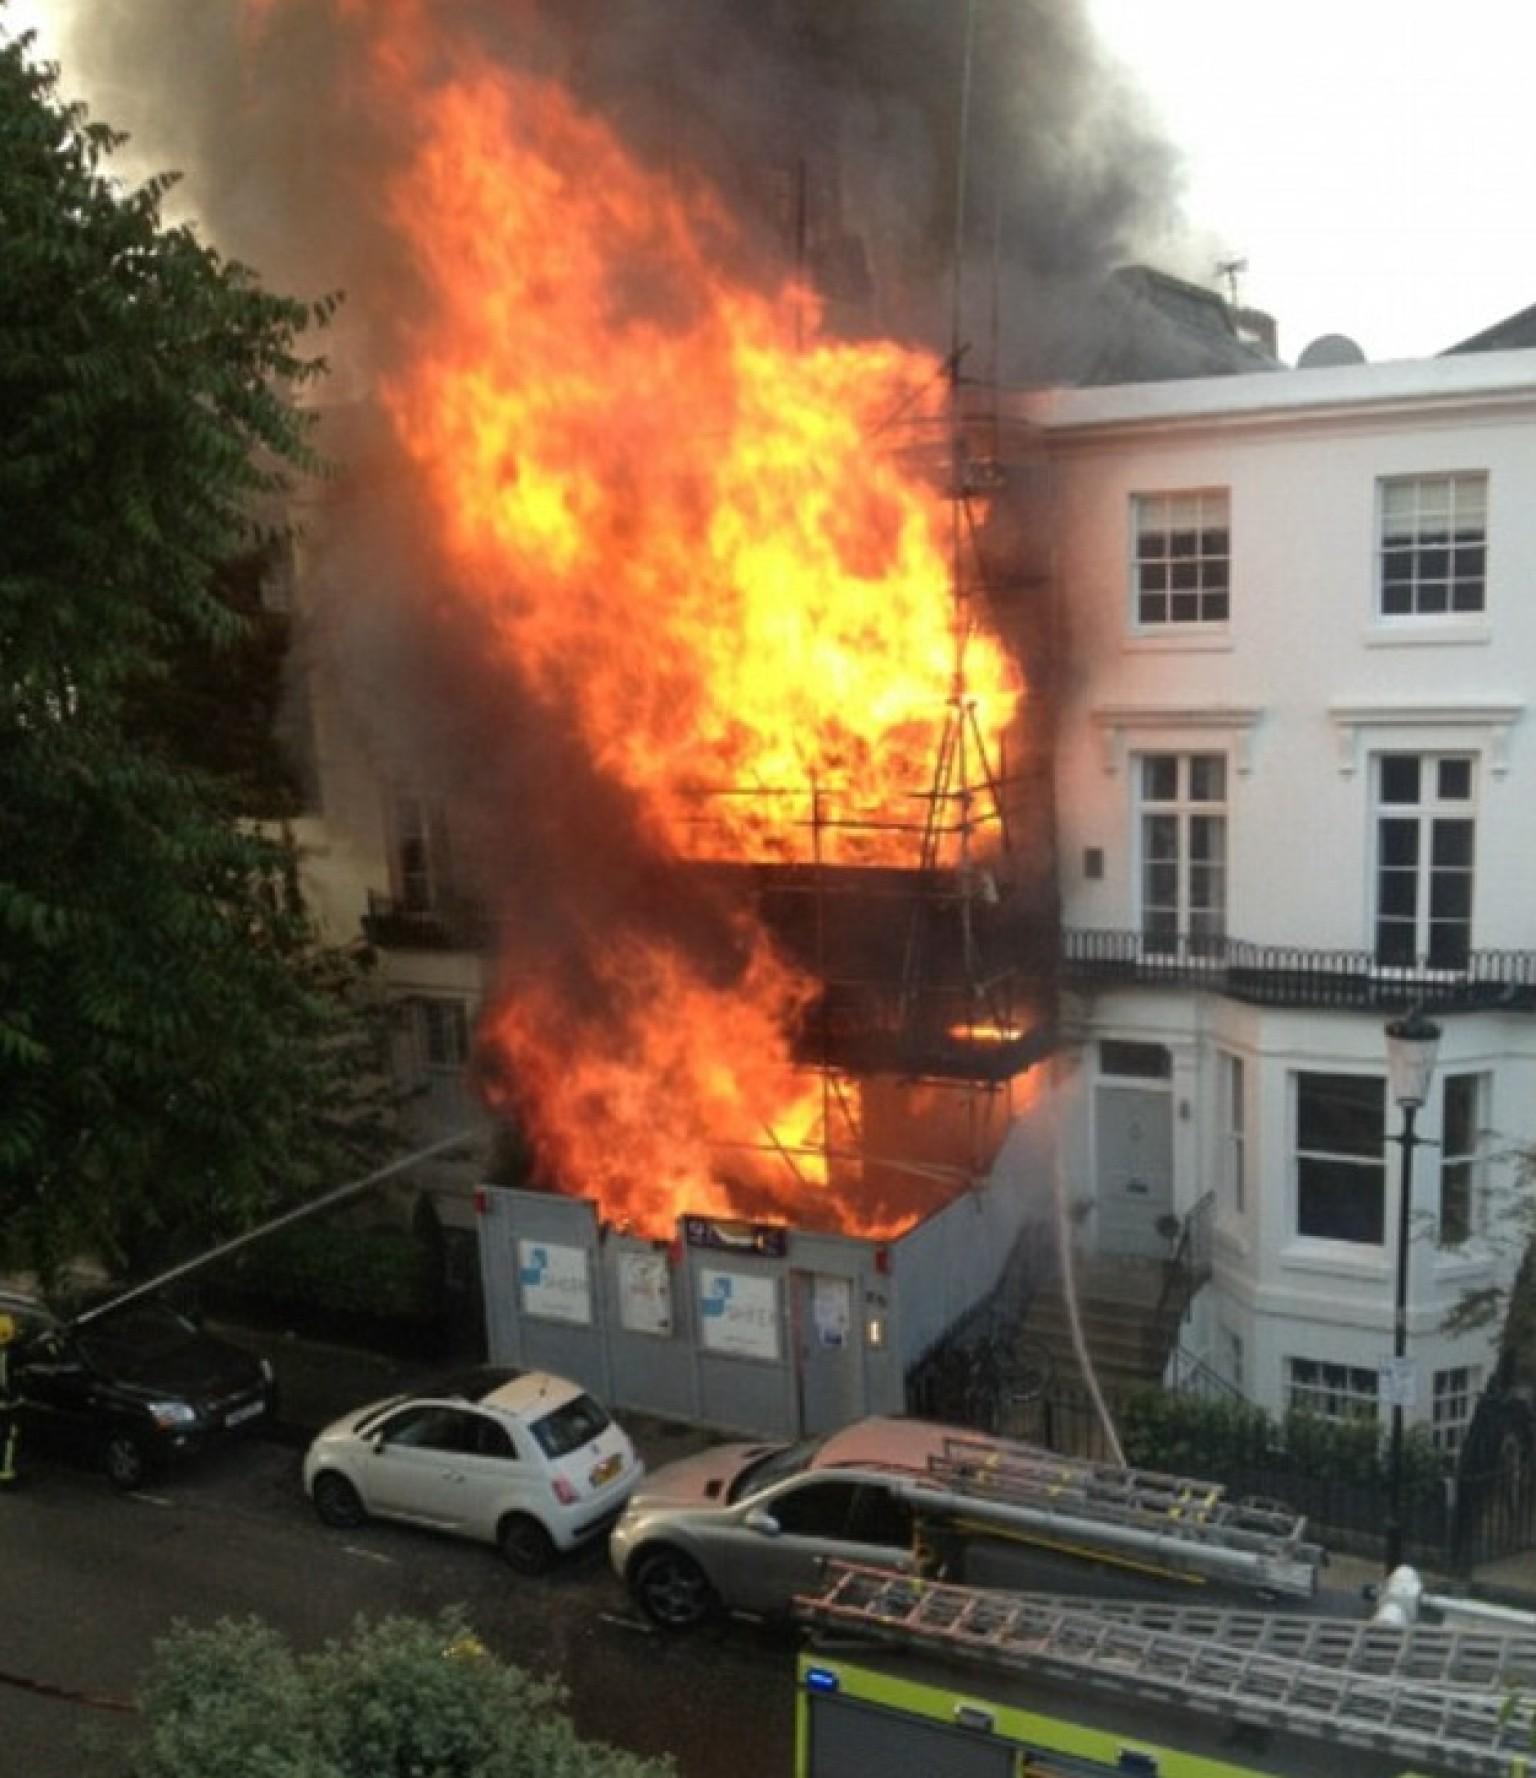 Kensington house fire 39 visibile from heathrow airport for The kensington house